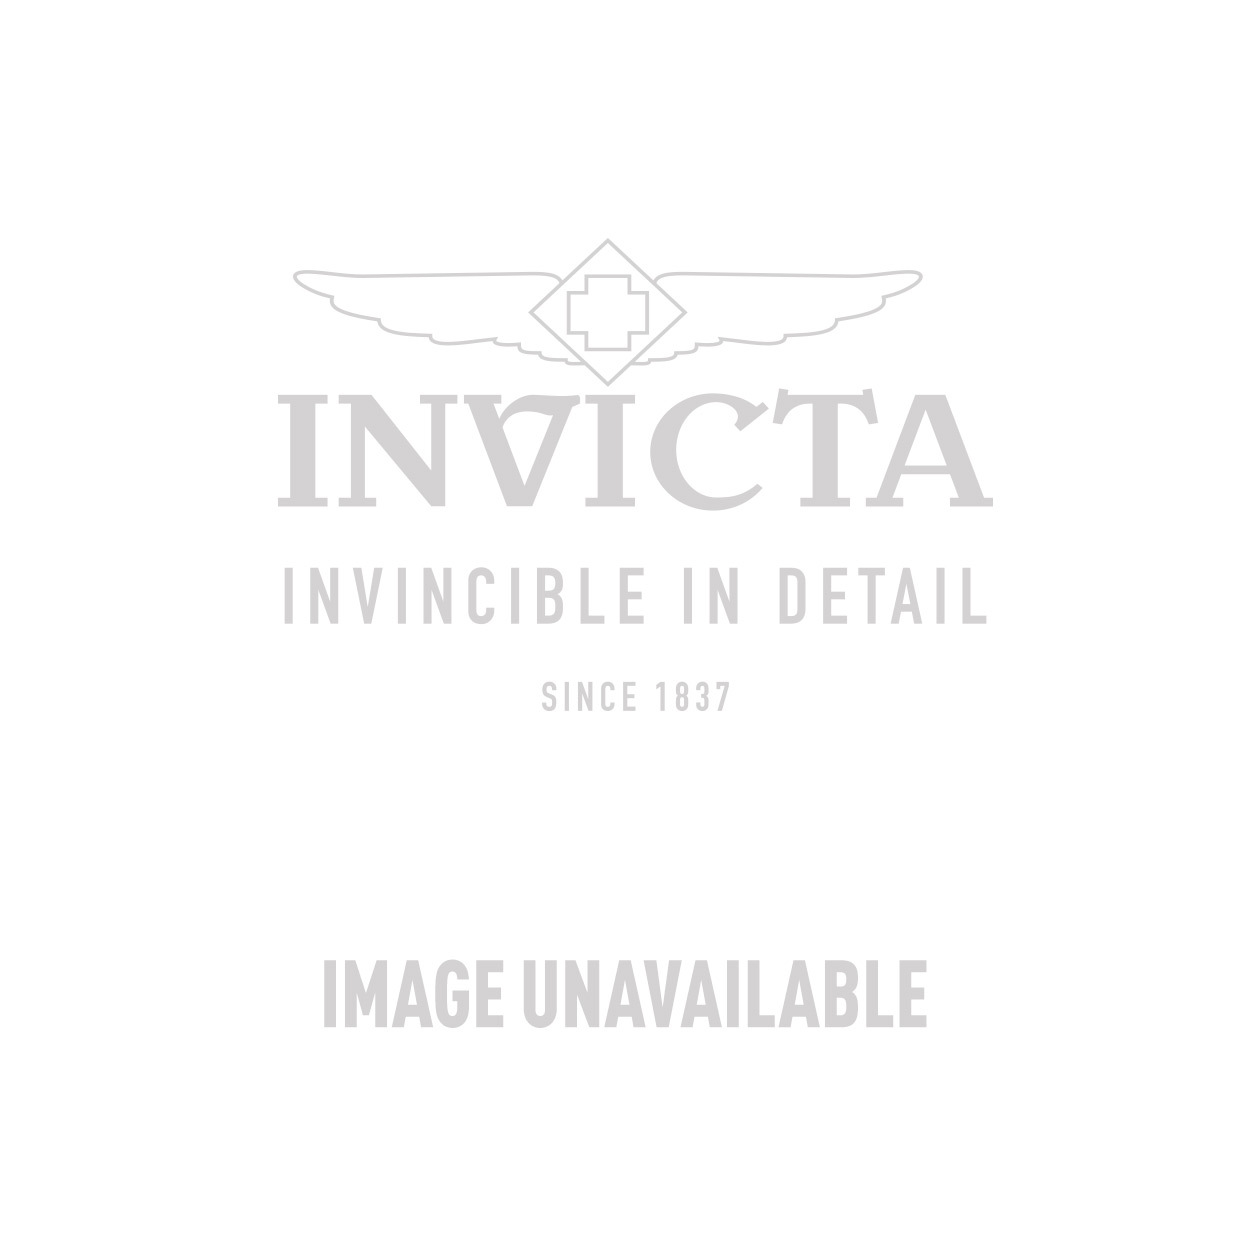 Invicta Venom  Quartz Watch - Black case with Black tone Stainless Steel band - Model 1599